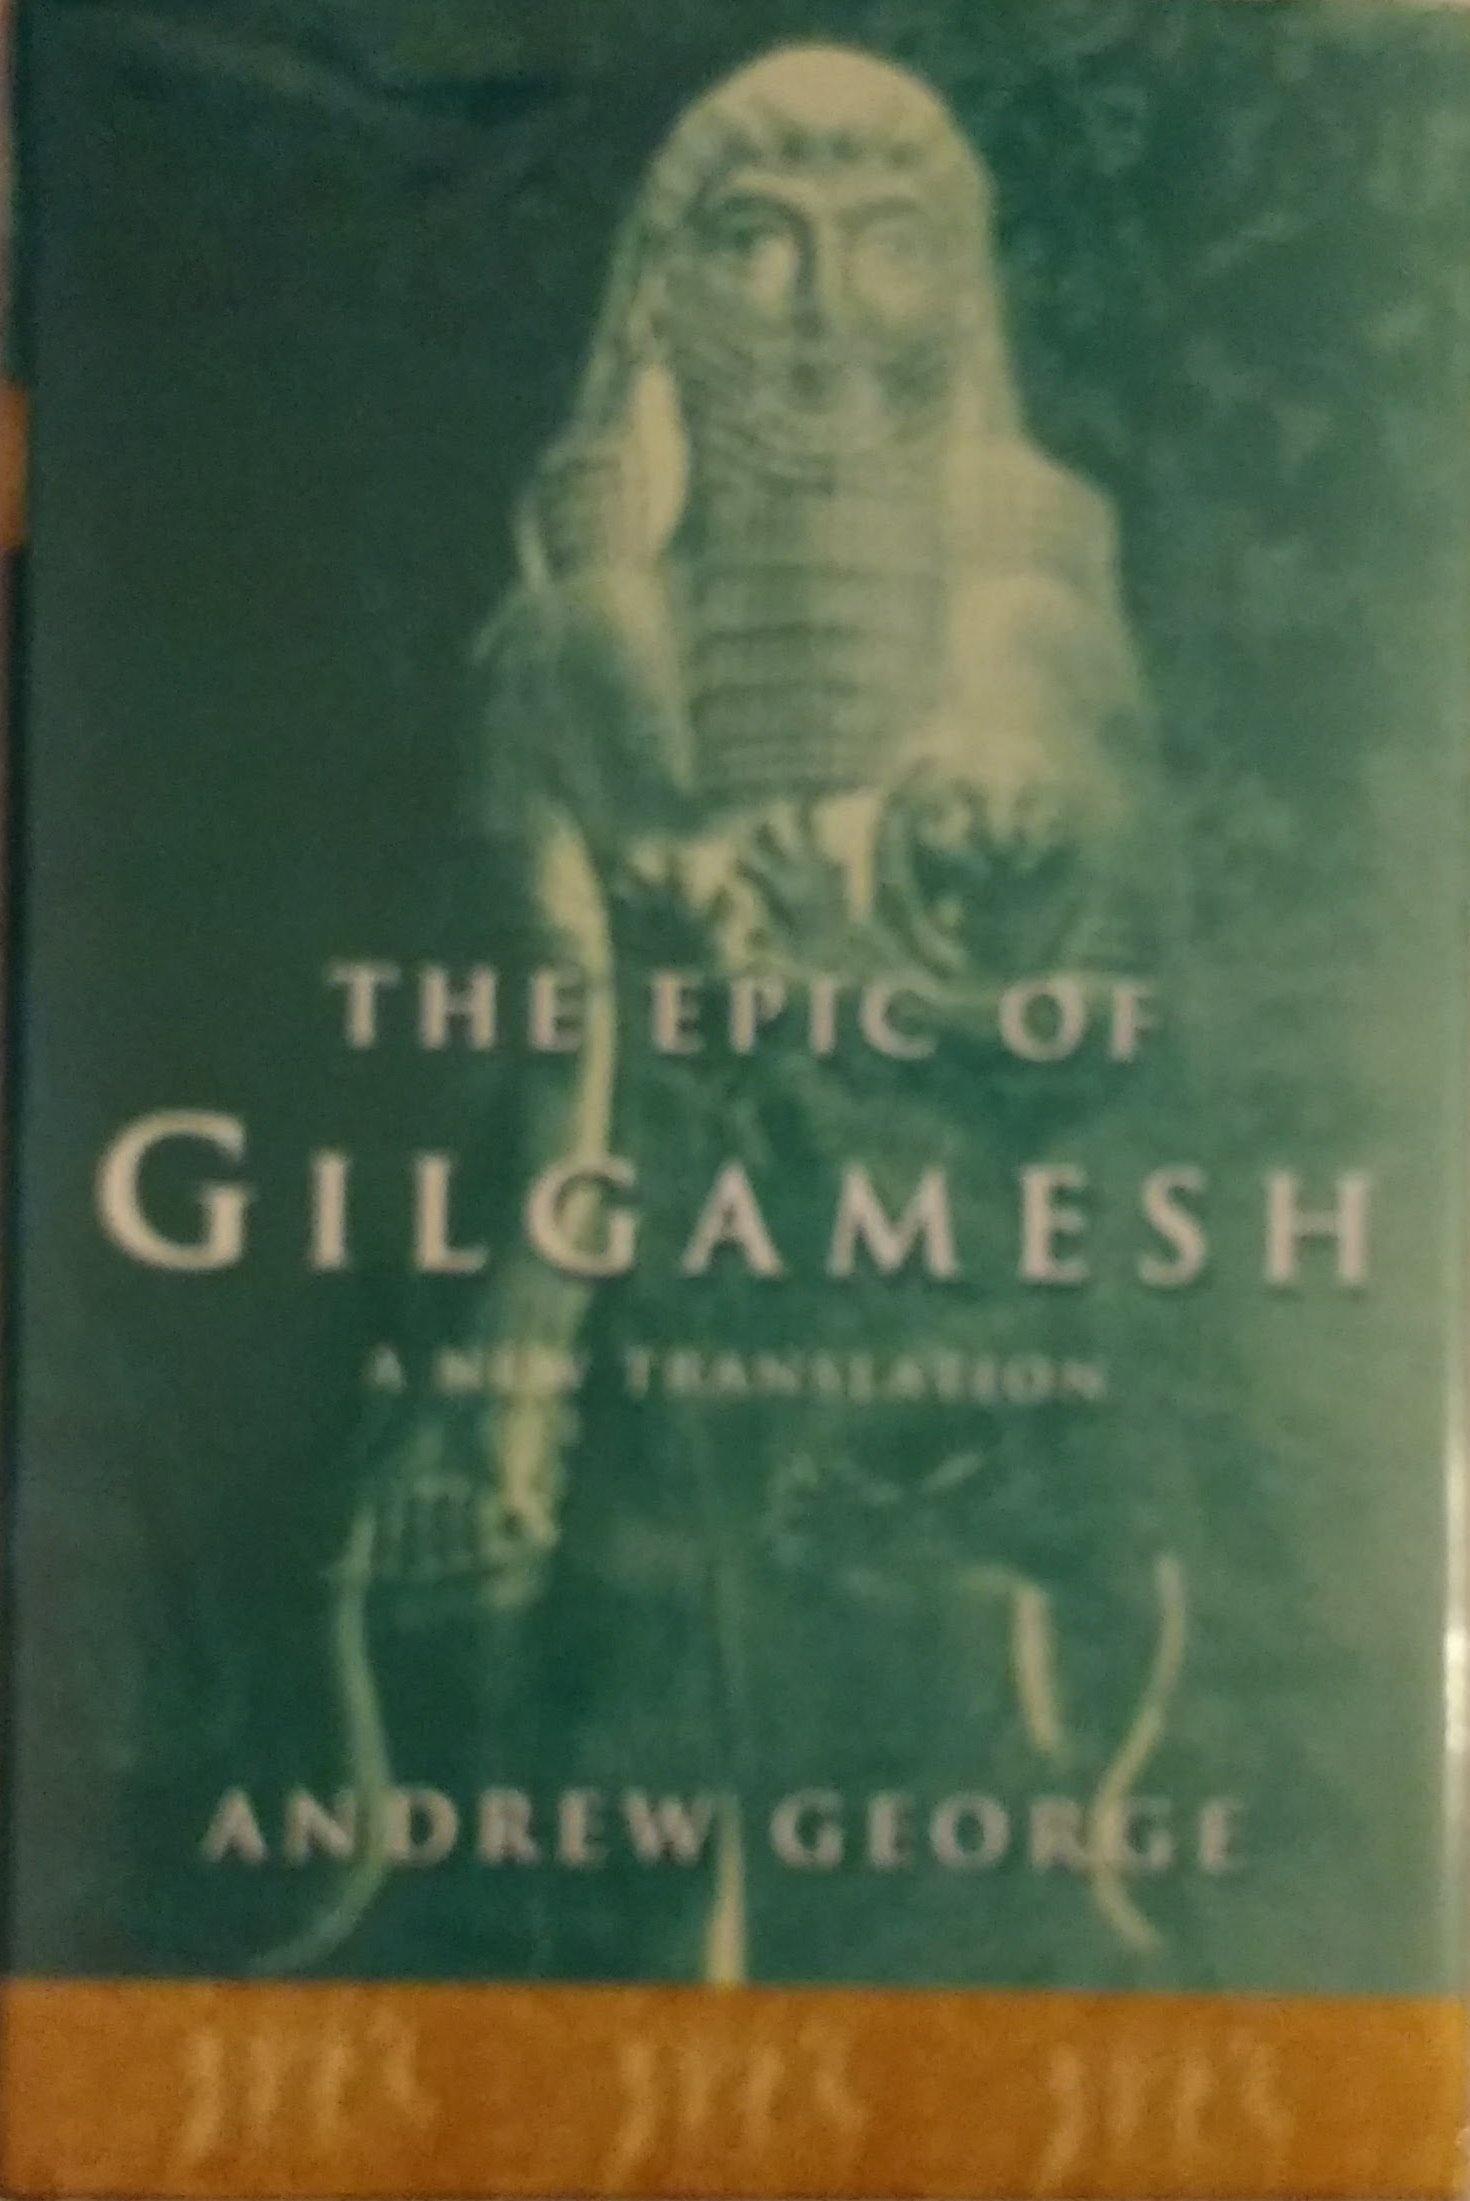 epic of gilgamesh nk sandars epub